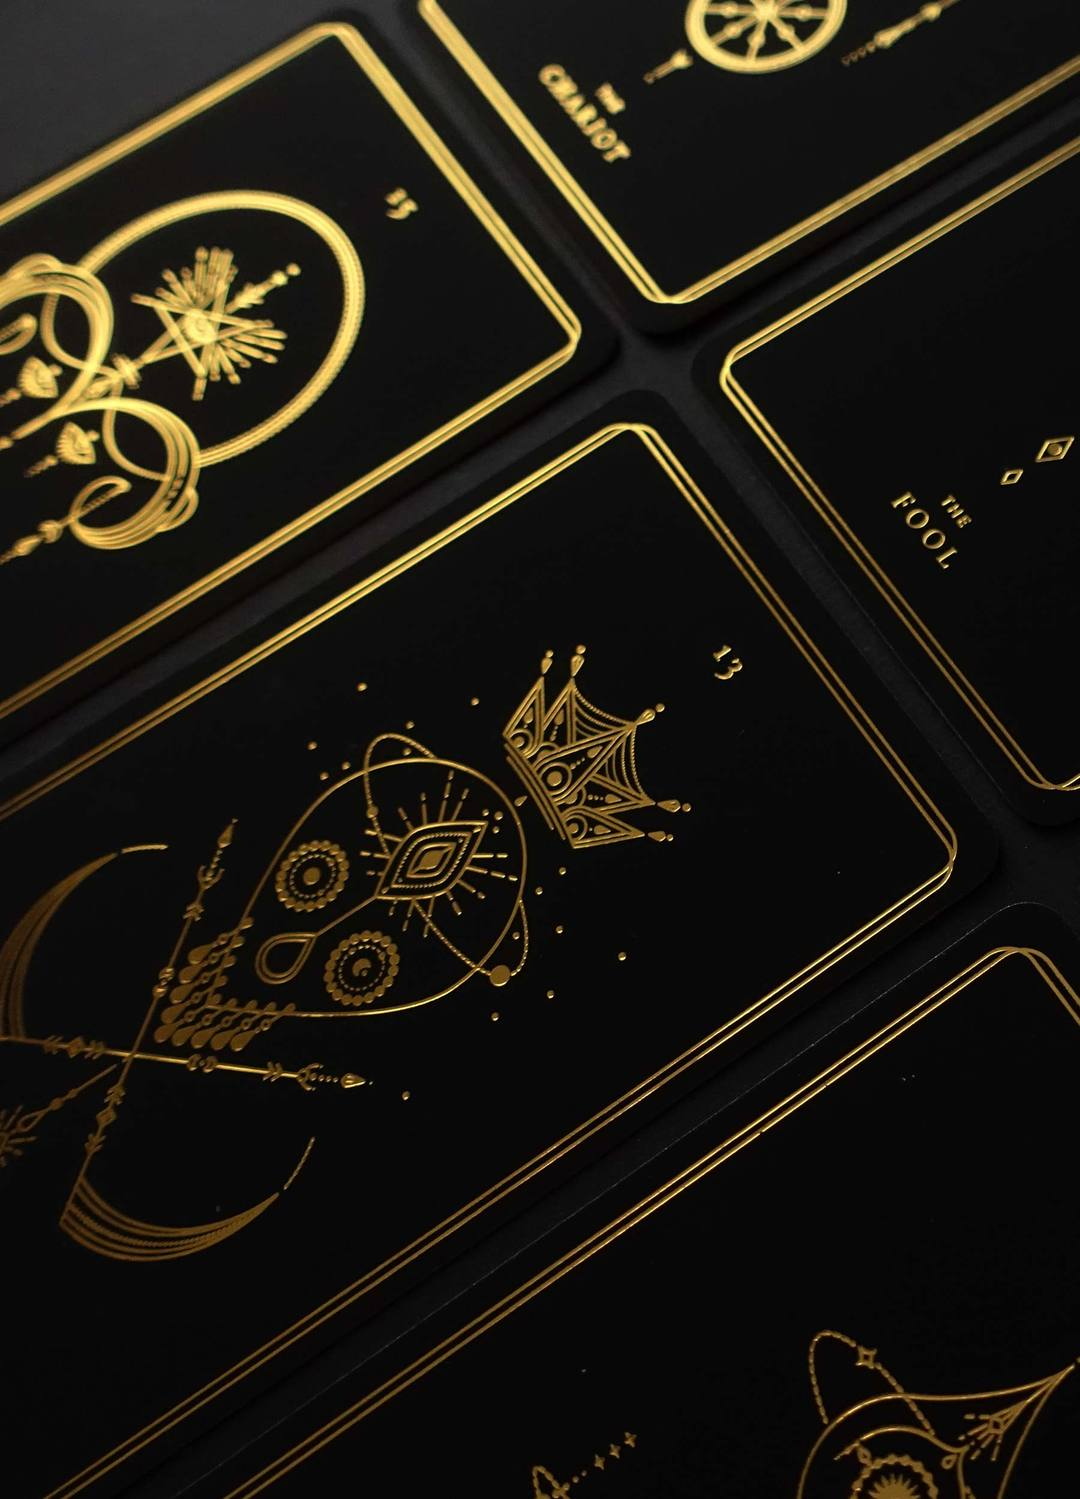 soul cards tarot.jpg